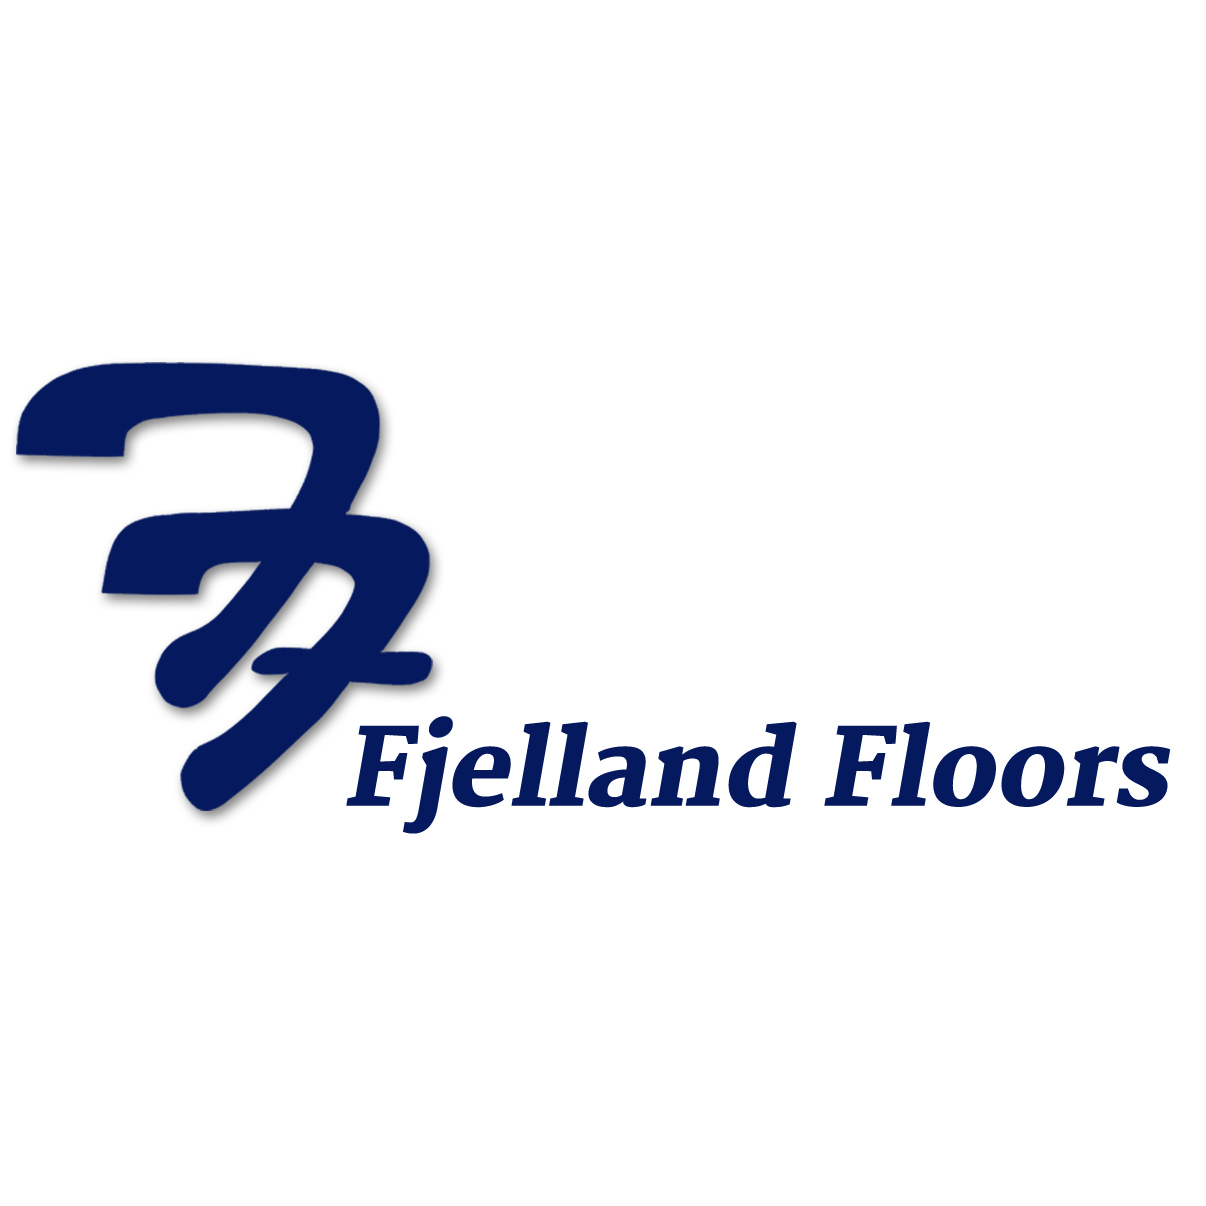 Fjelland Floors McMinnville Oregon